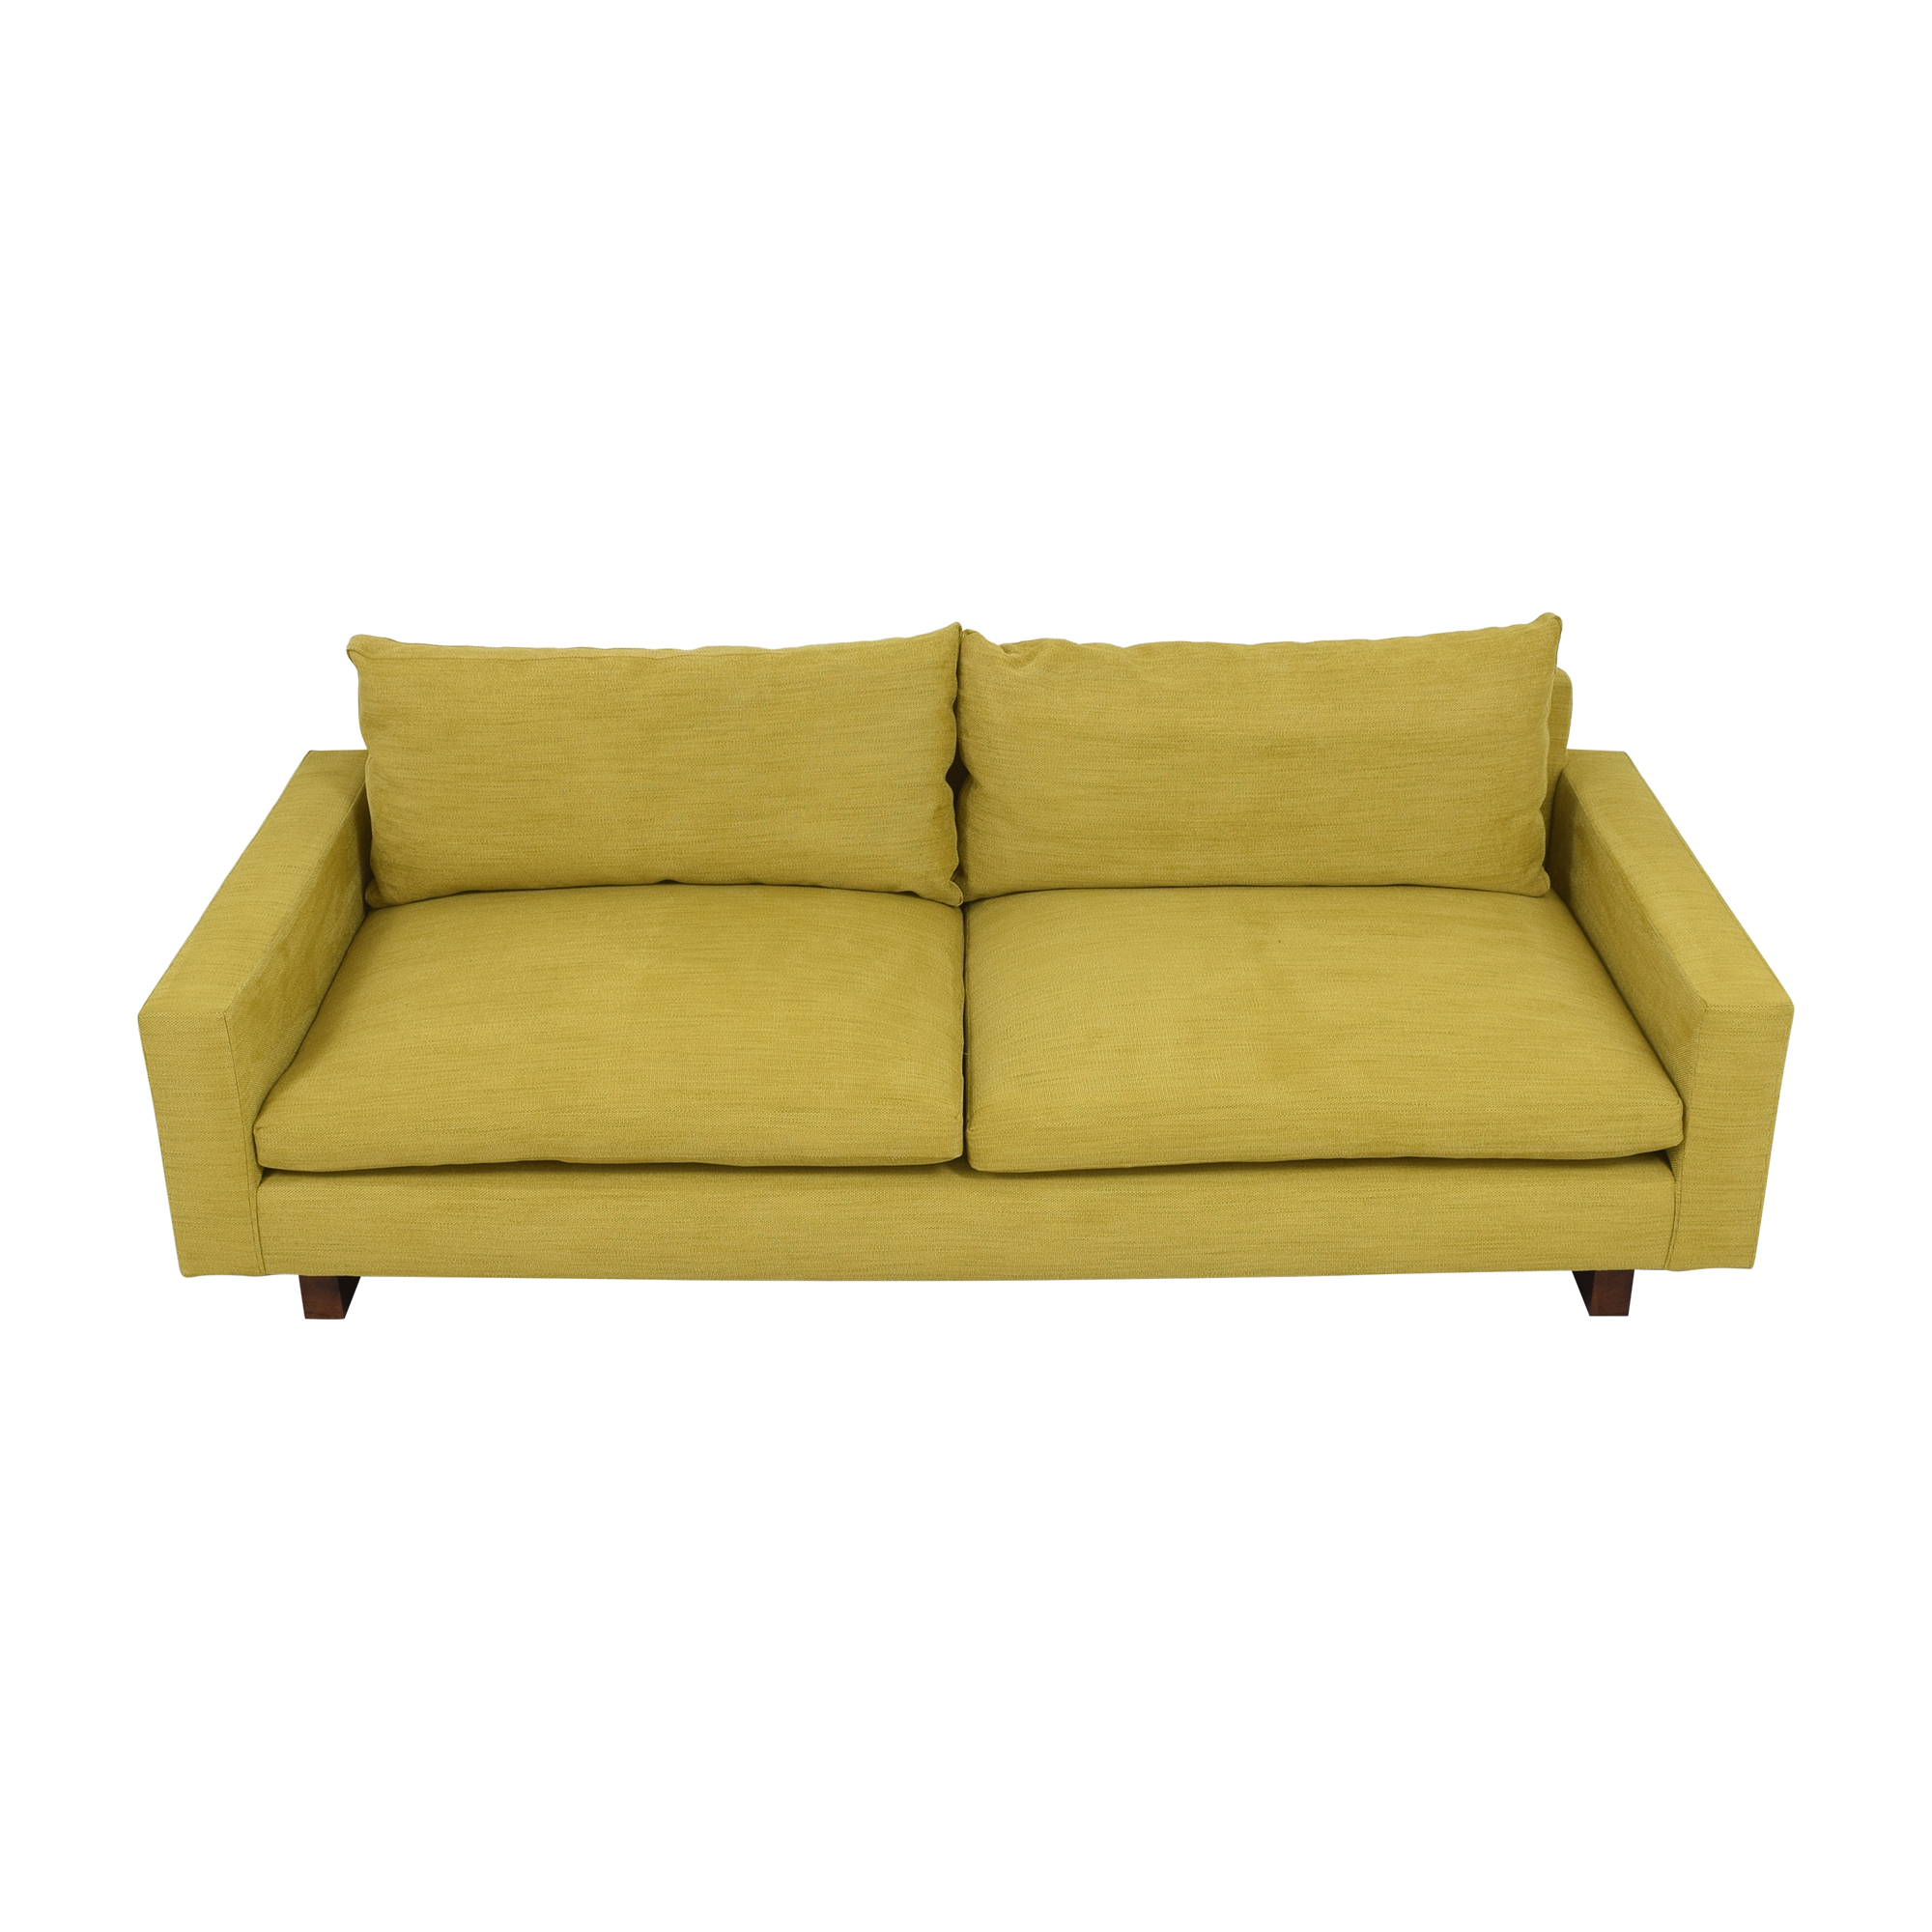 West Elm Harmony Two Cushion Sofa sale